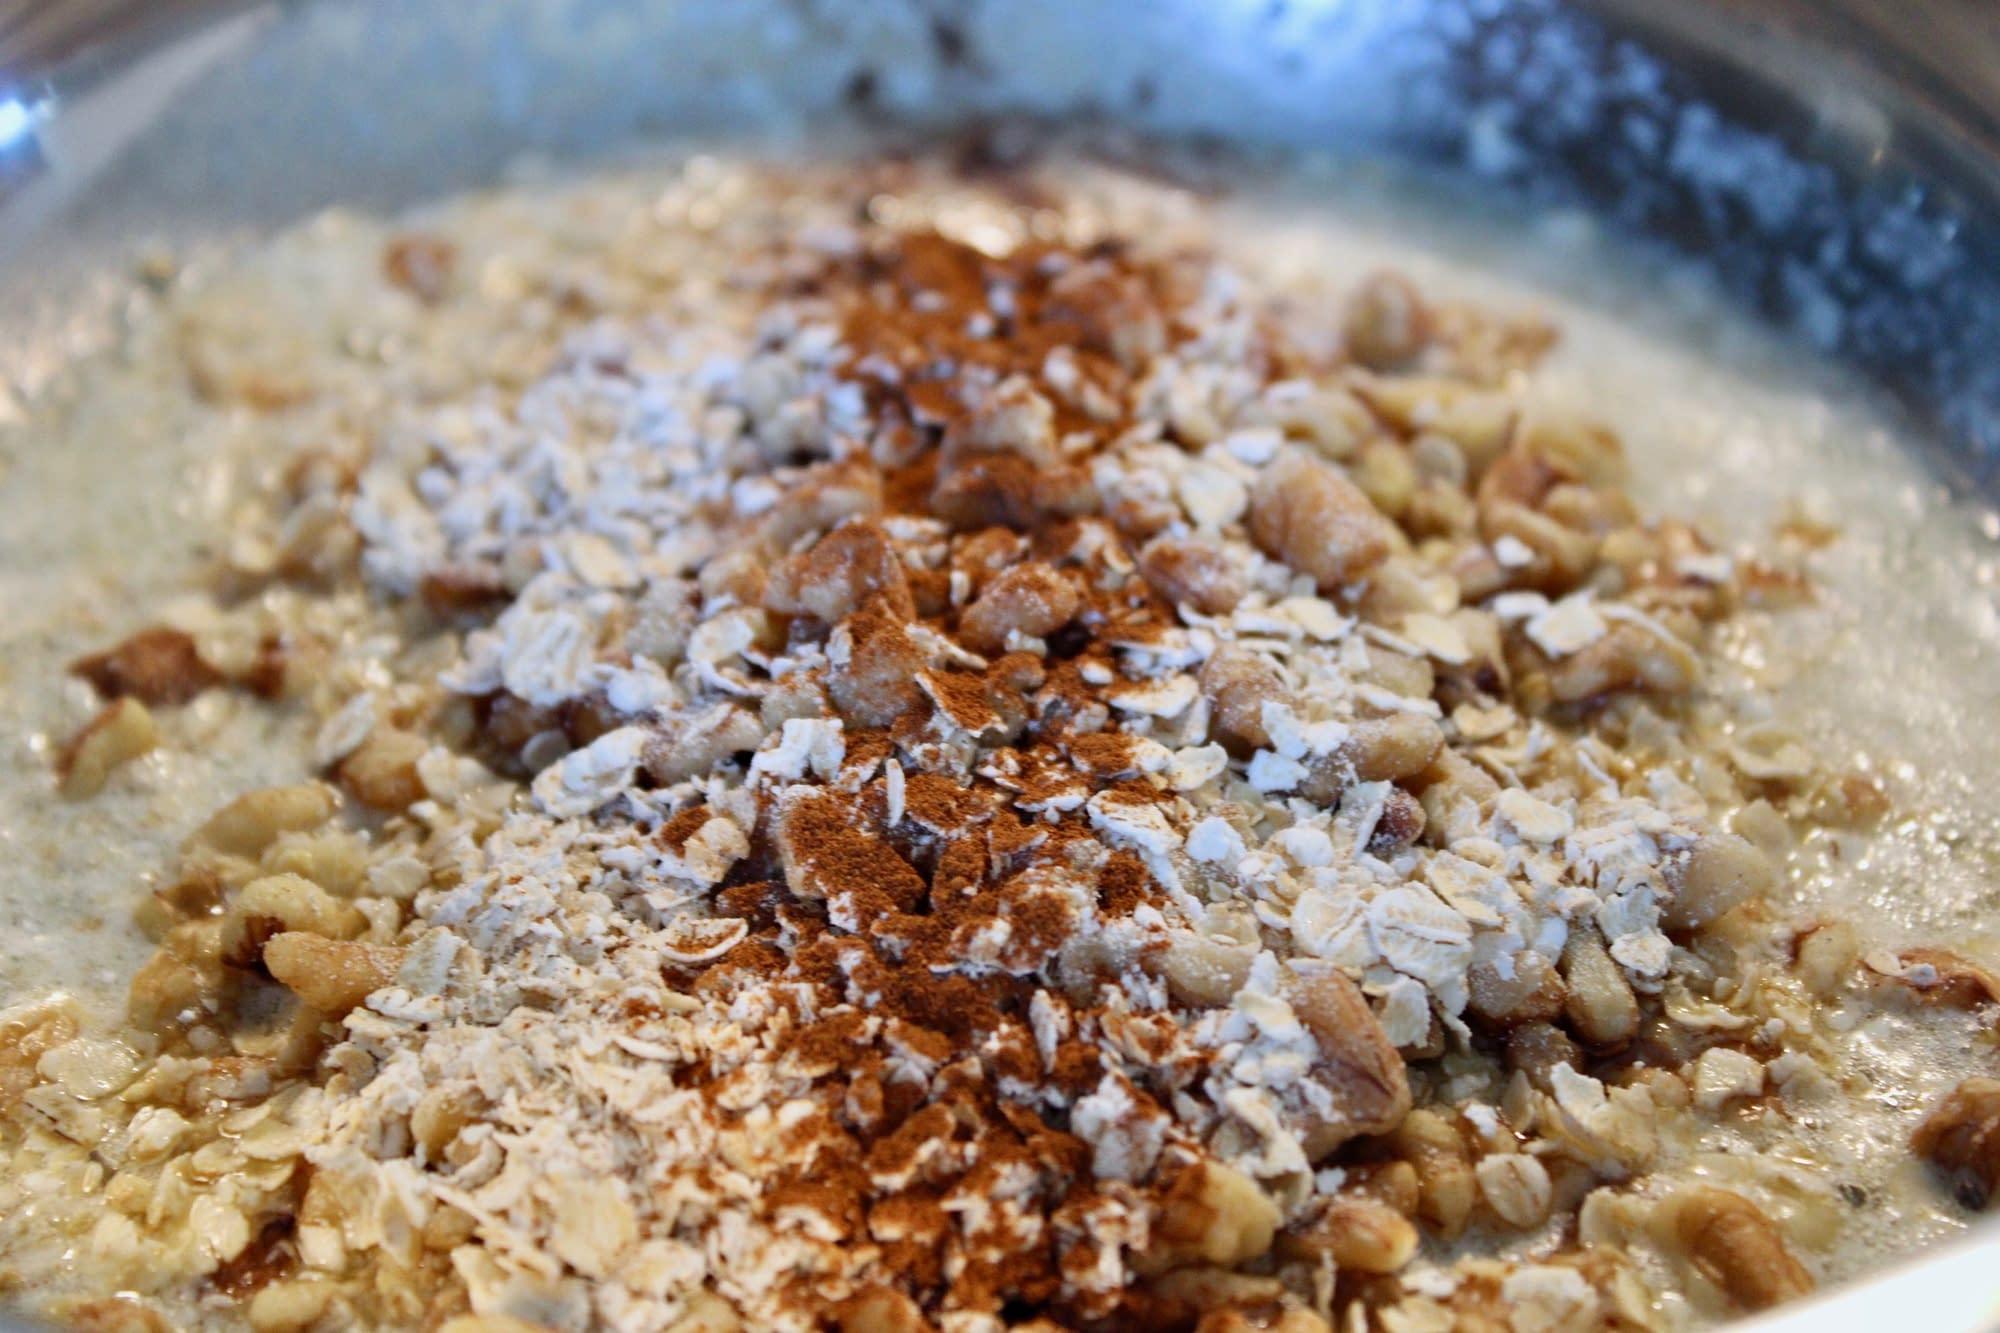 Streusel topping cooking pan.